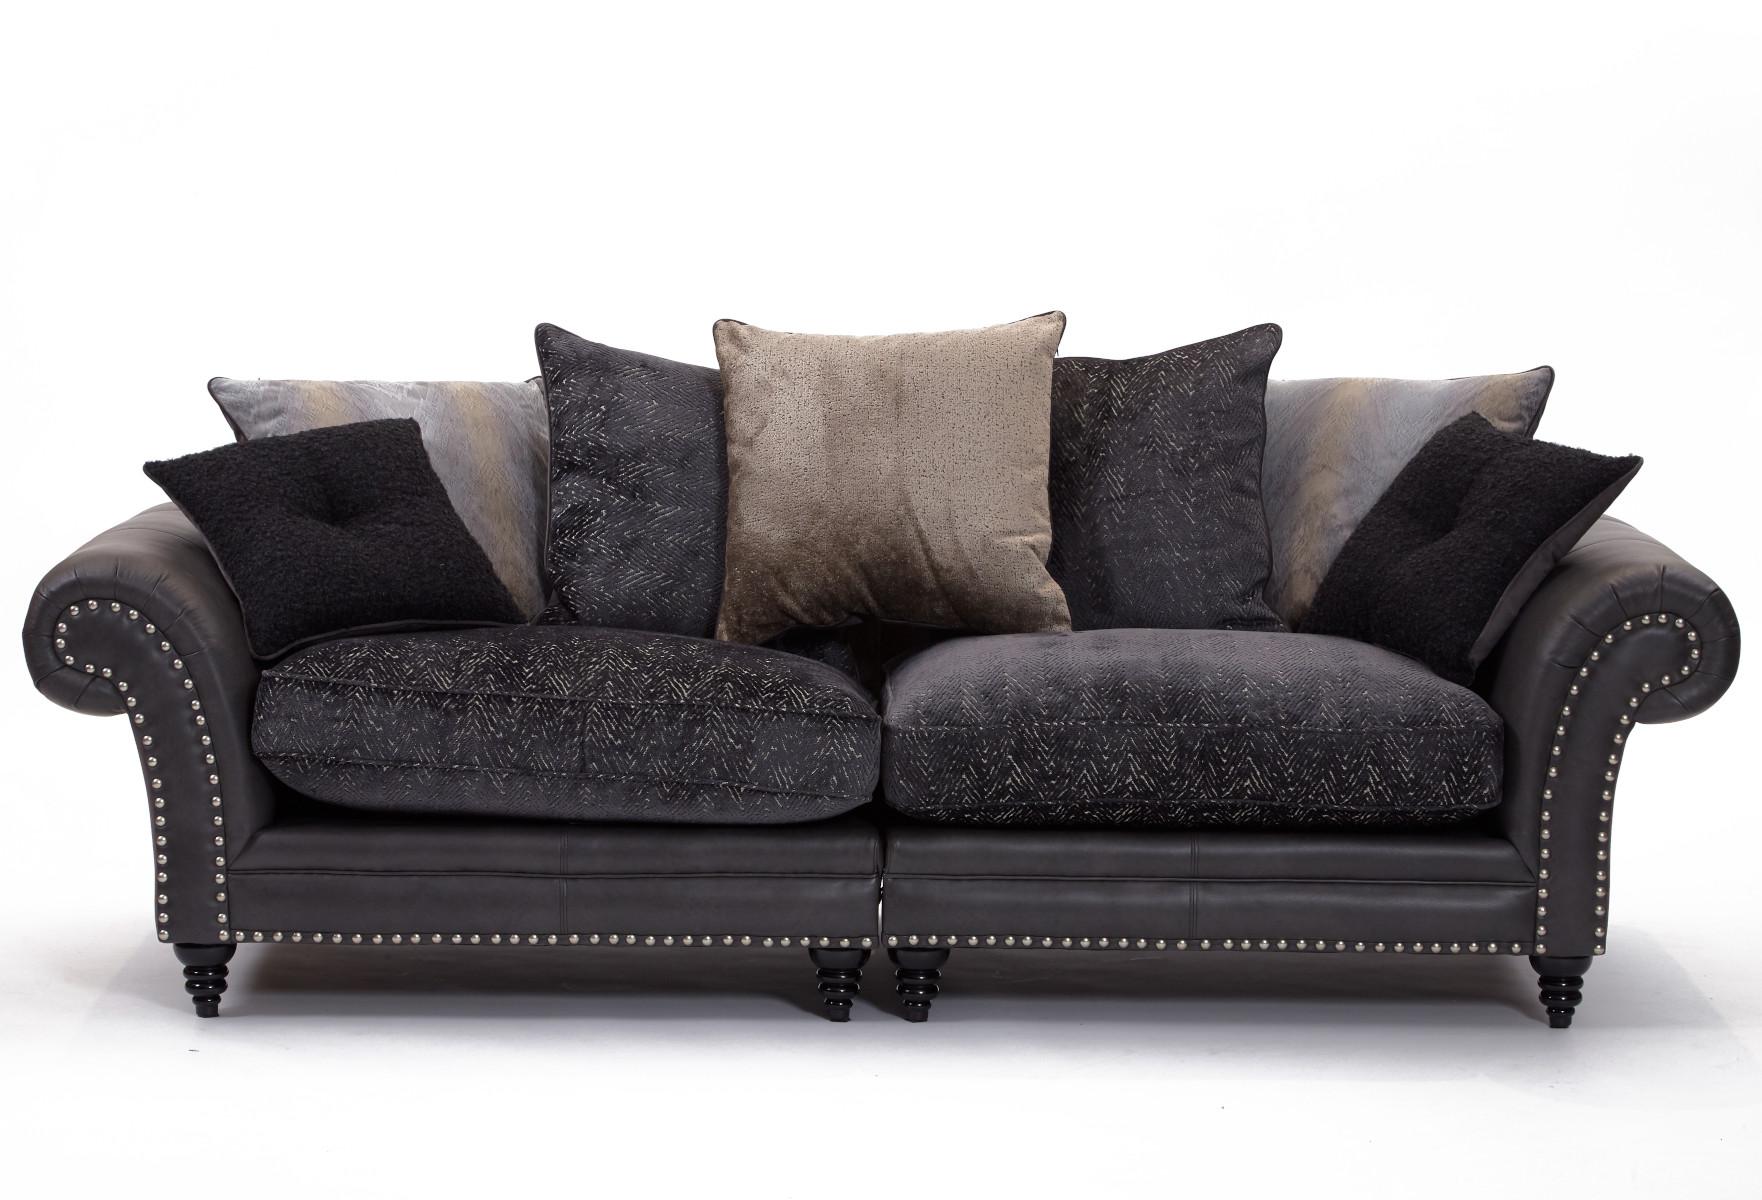 Bardot 4 Seater Sofa